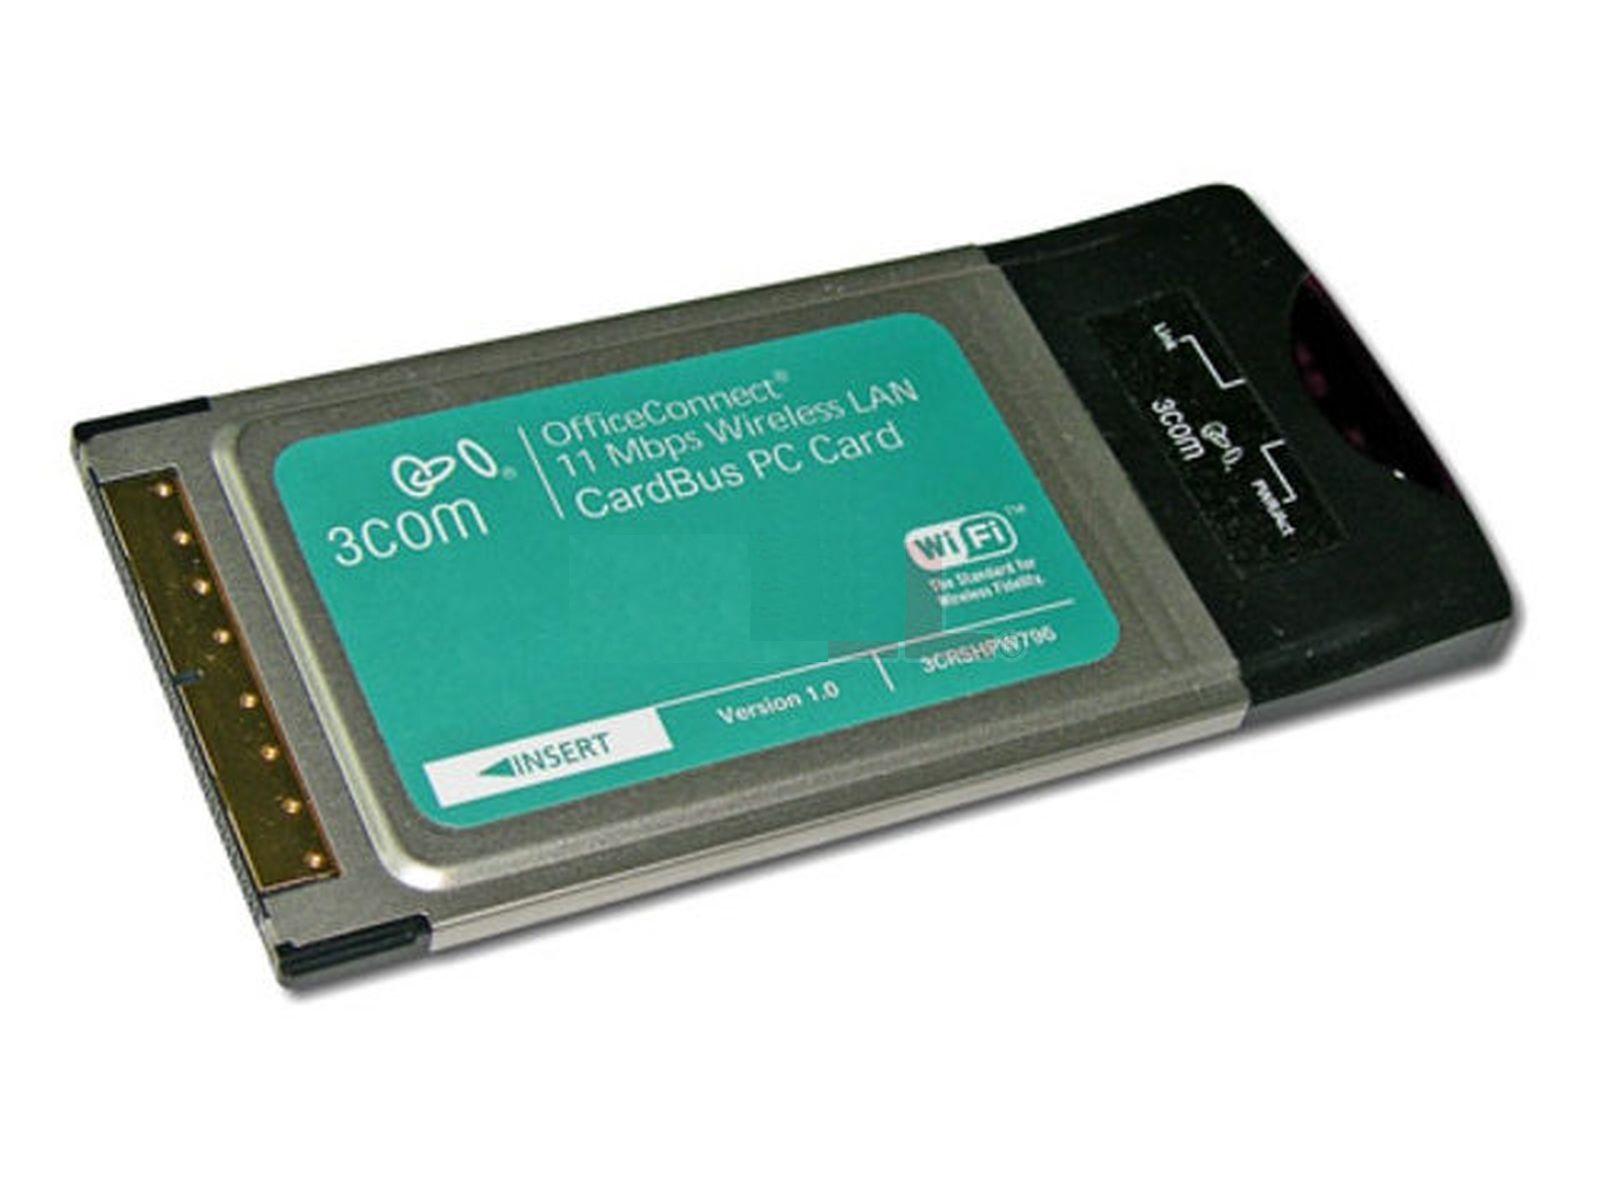 3com etherlink 10/100 pci nic (3c905-tx) drivers.